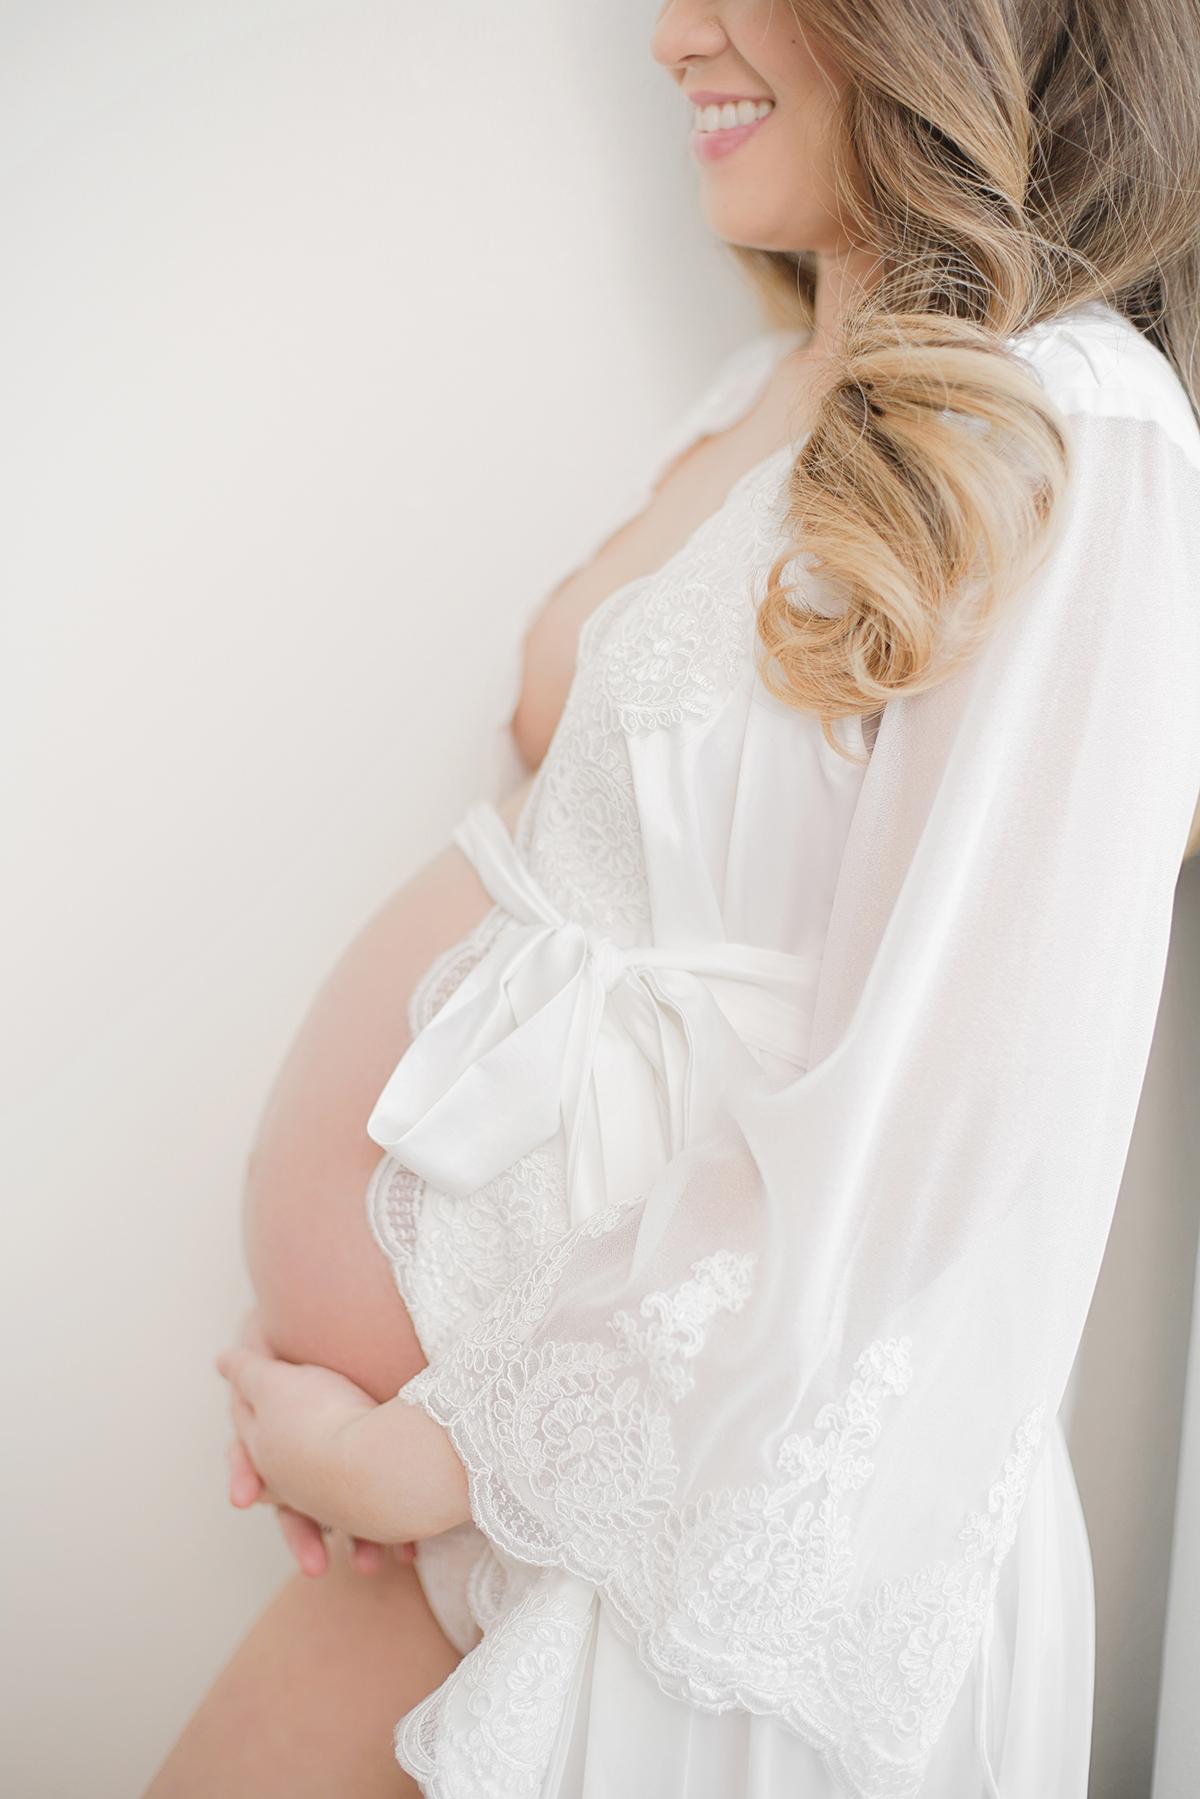 Maann Maternity 15